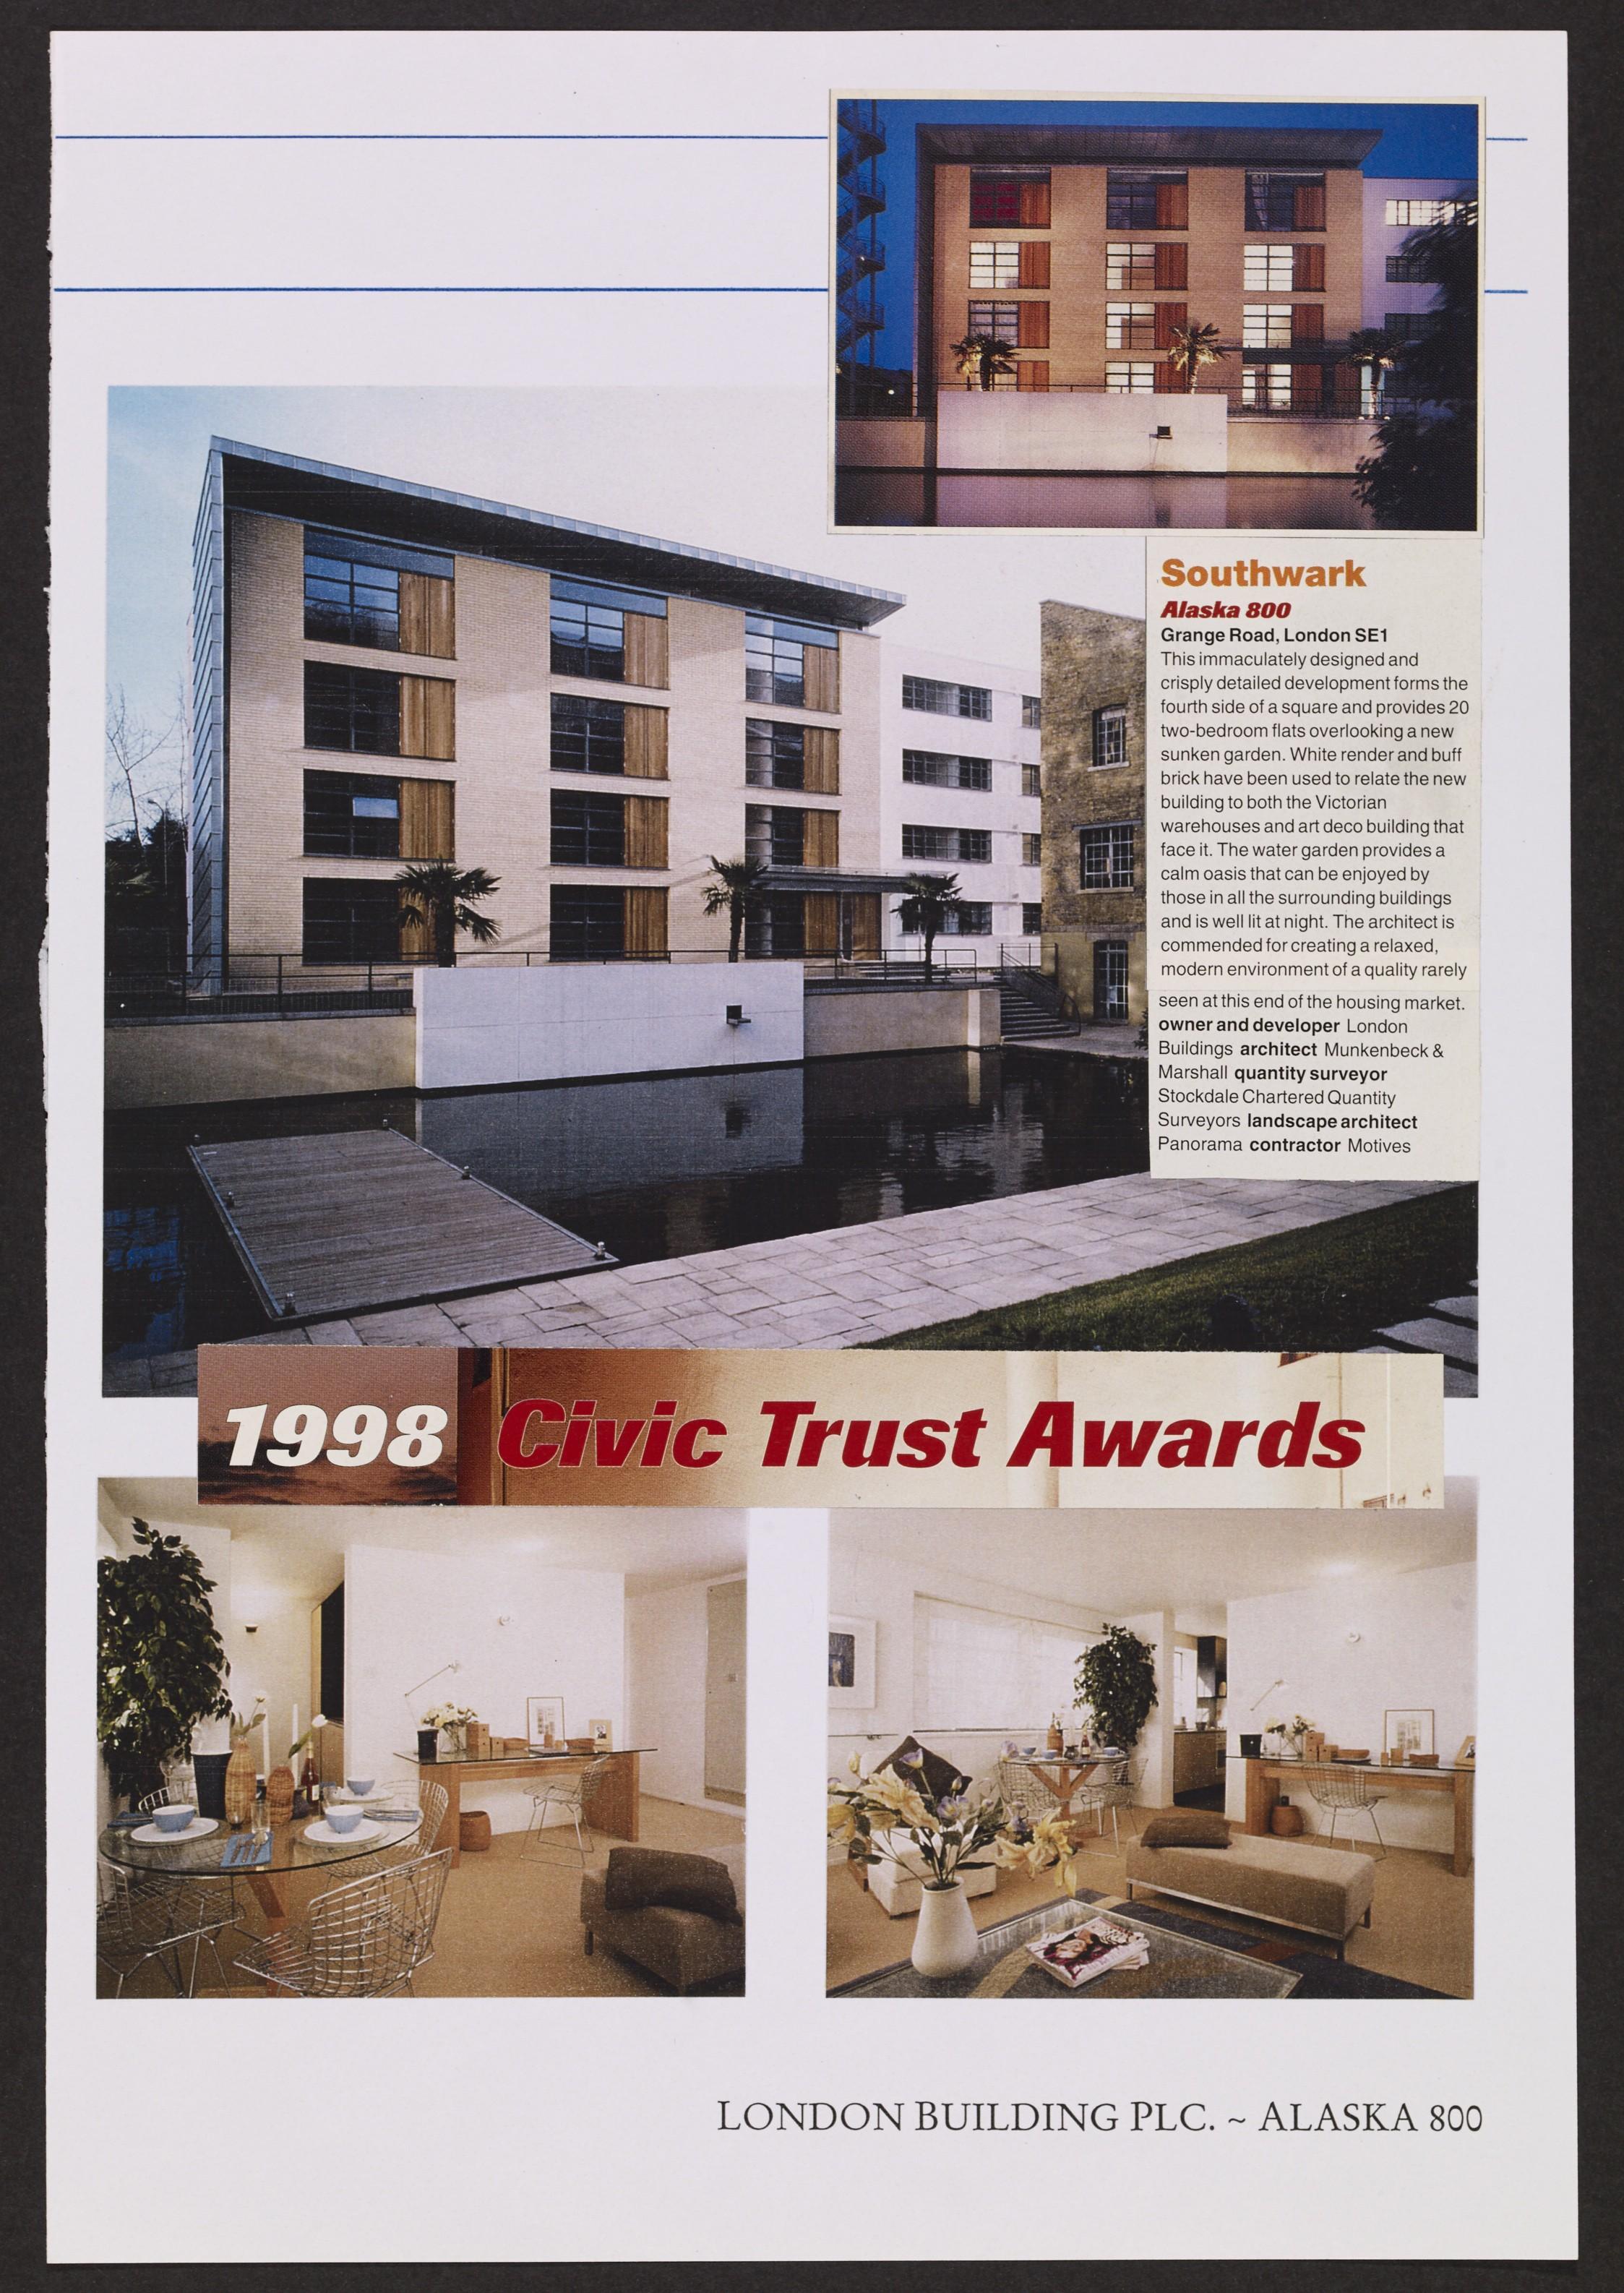 Alaska 800 features in the Civics Trusts Awards